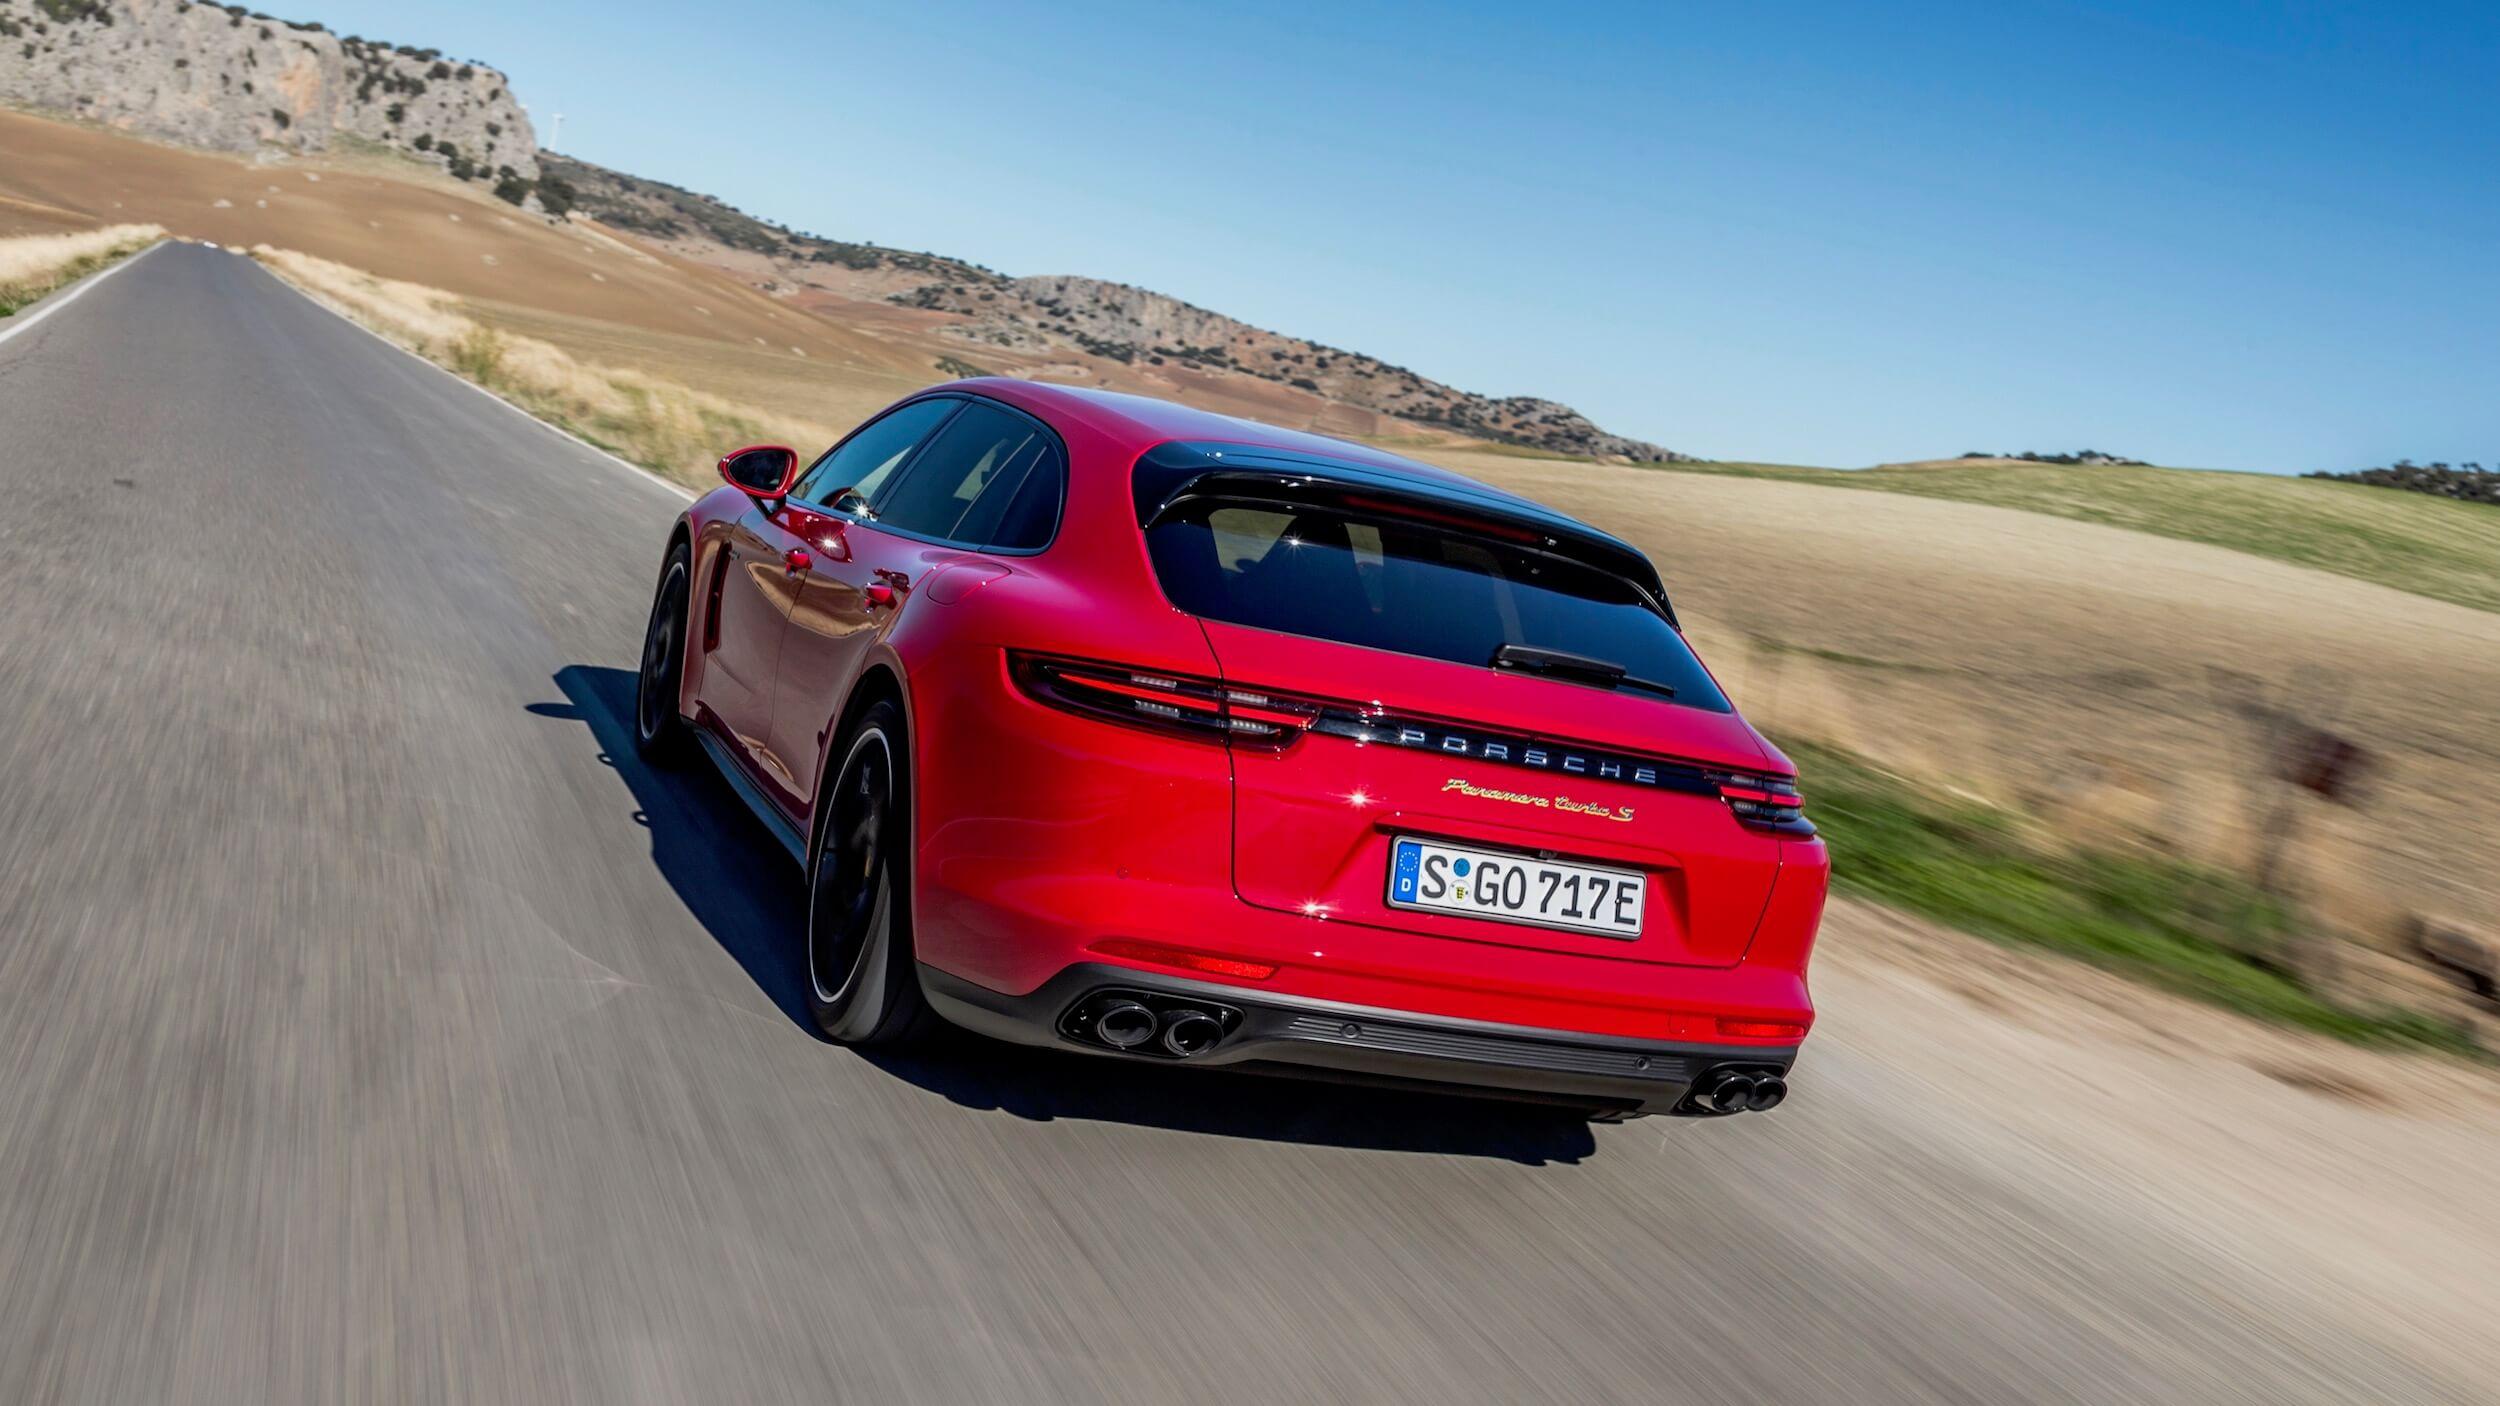 Porsche Sport Turismo híbrido plug-in